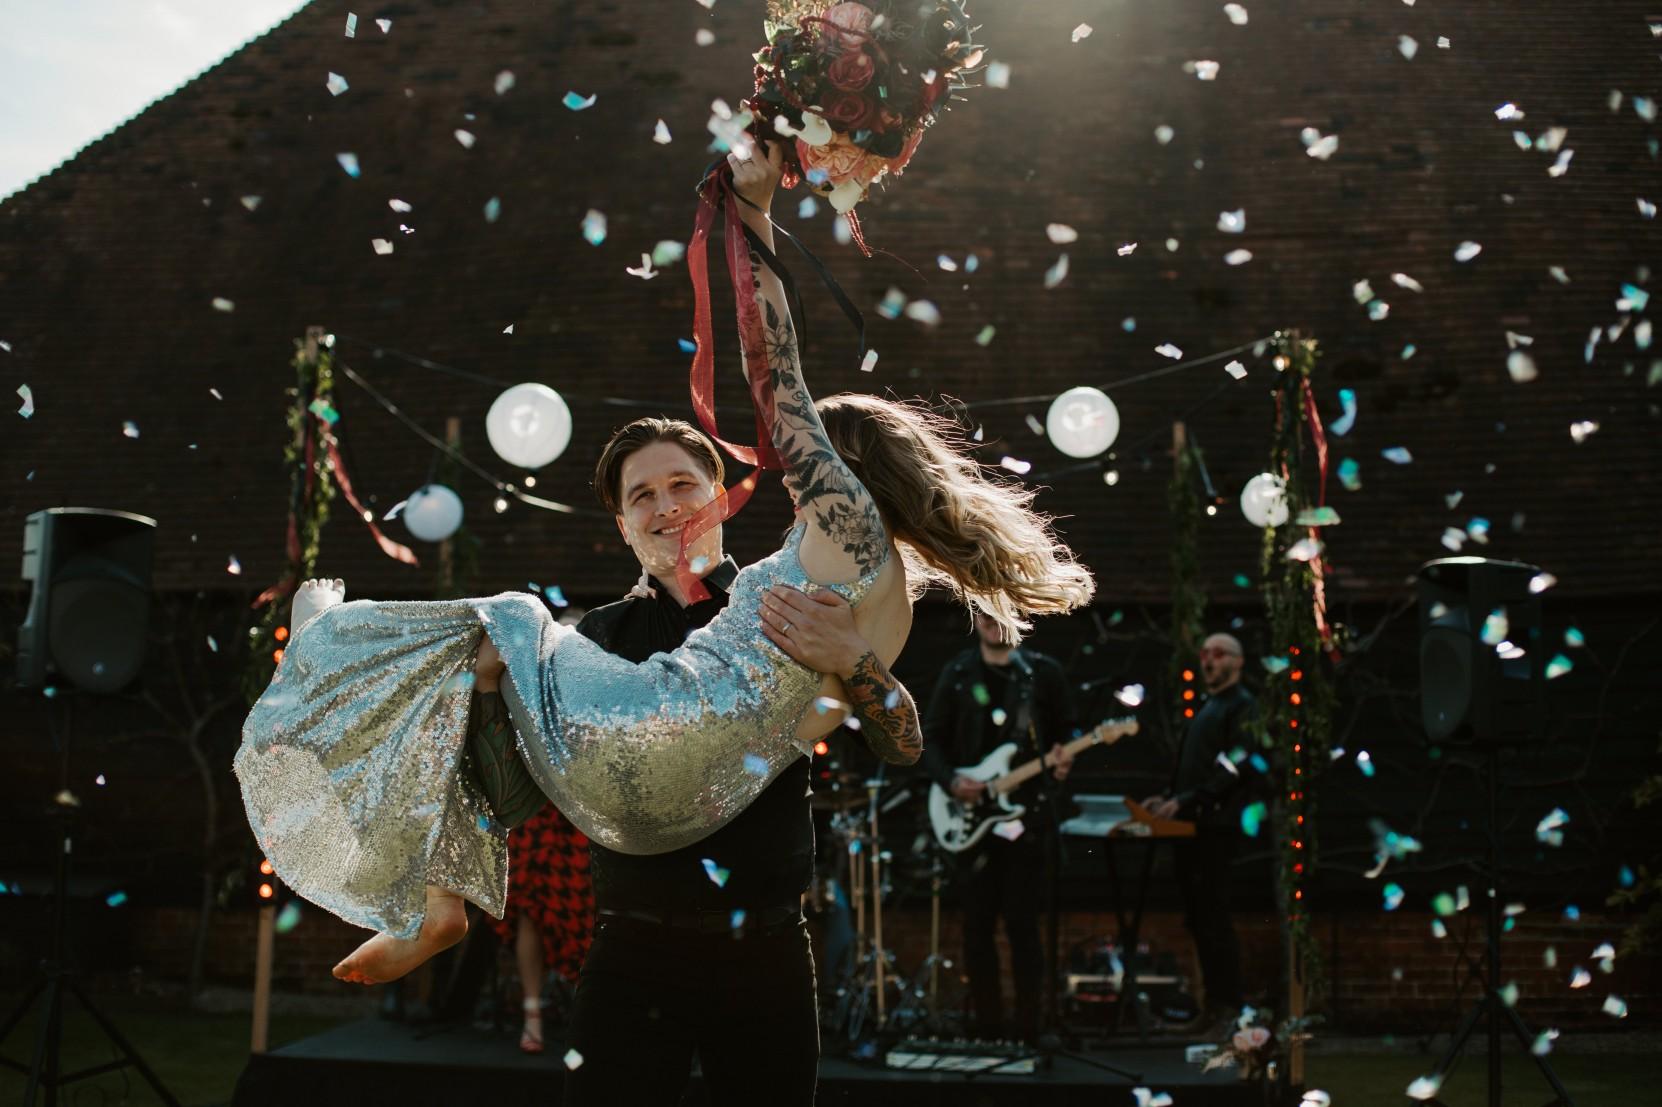 rock and roll wedding - edgy wedding inspiration - wedding confetti photo - sparkly wedding dress - sequin wedding dress